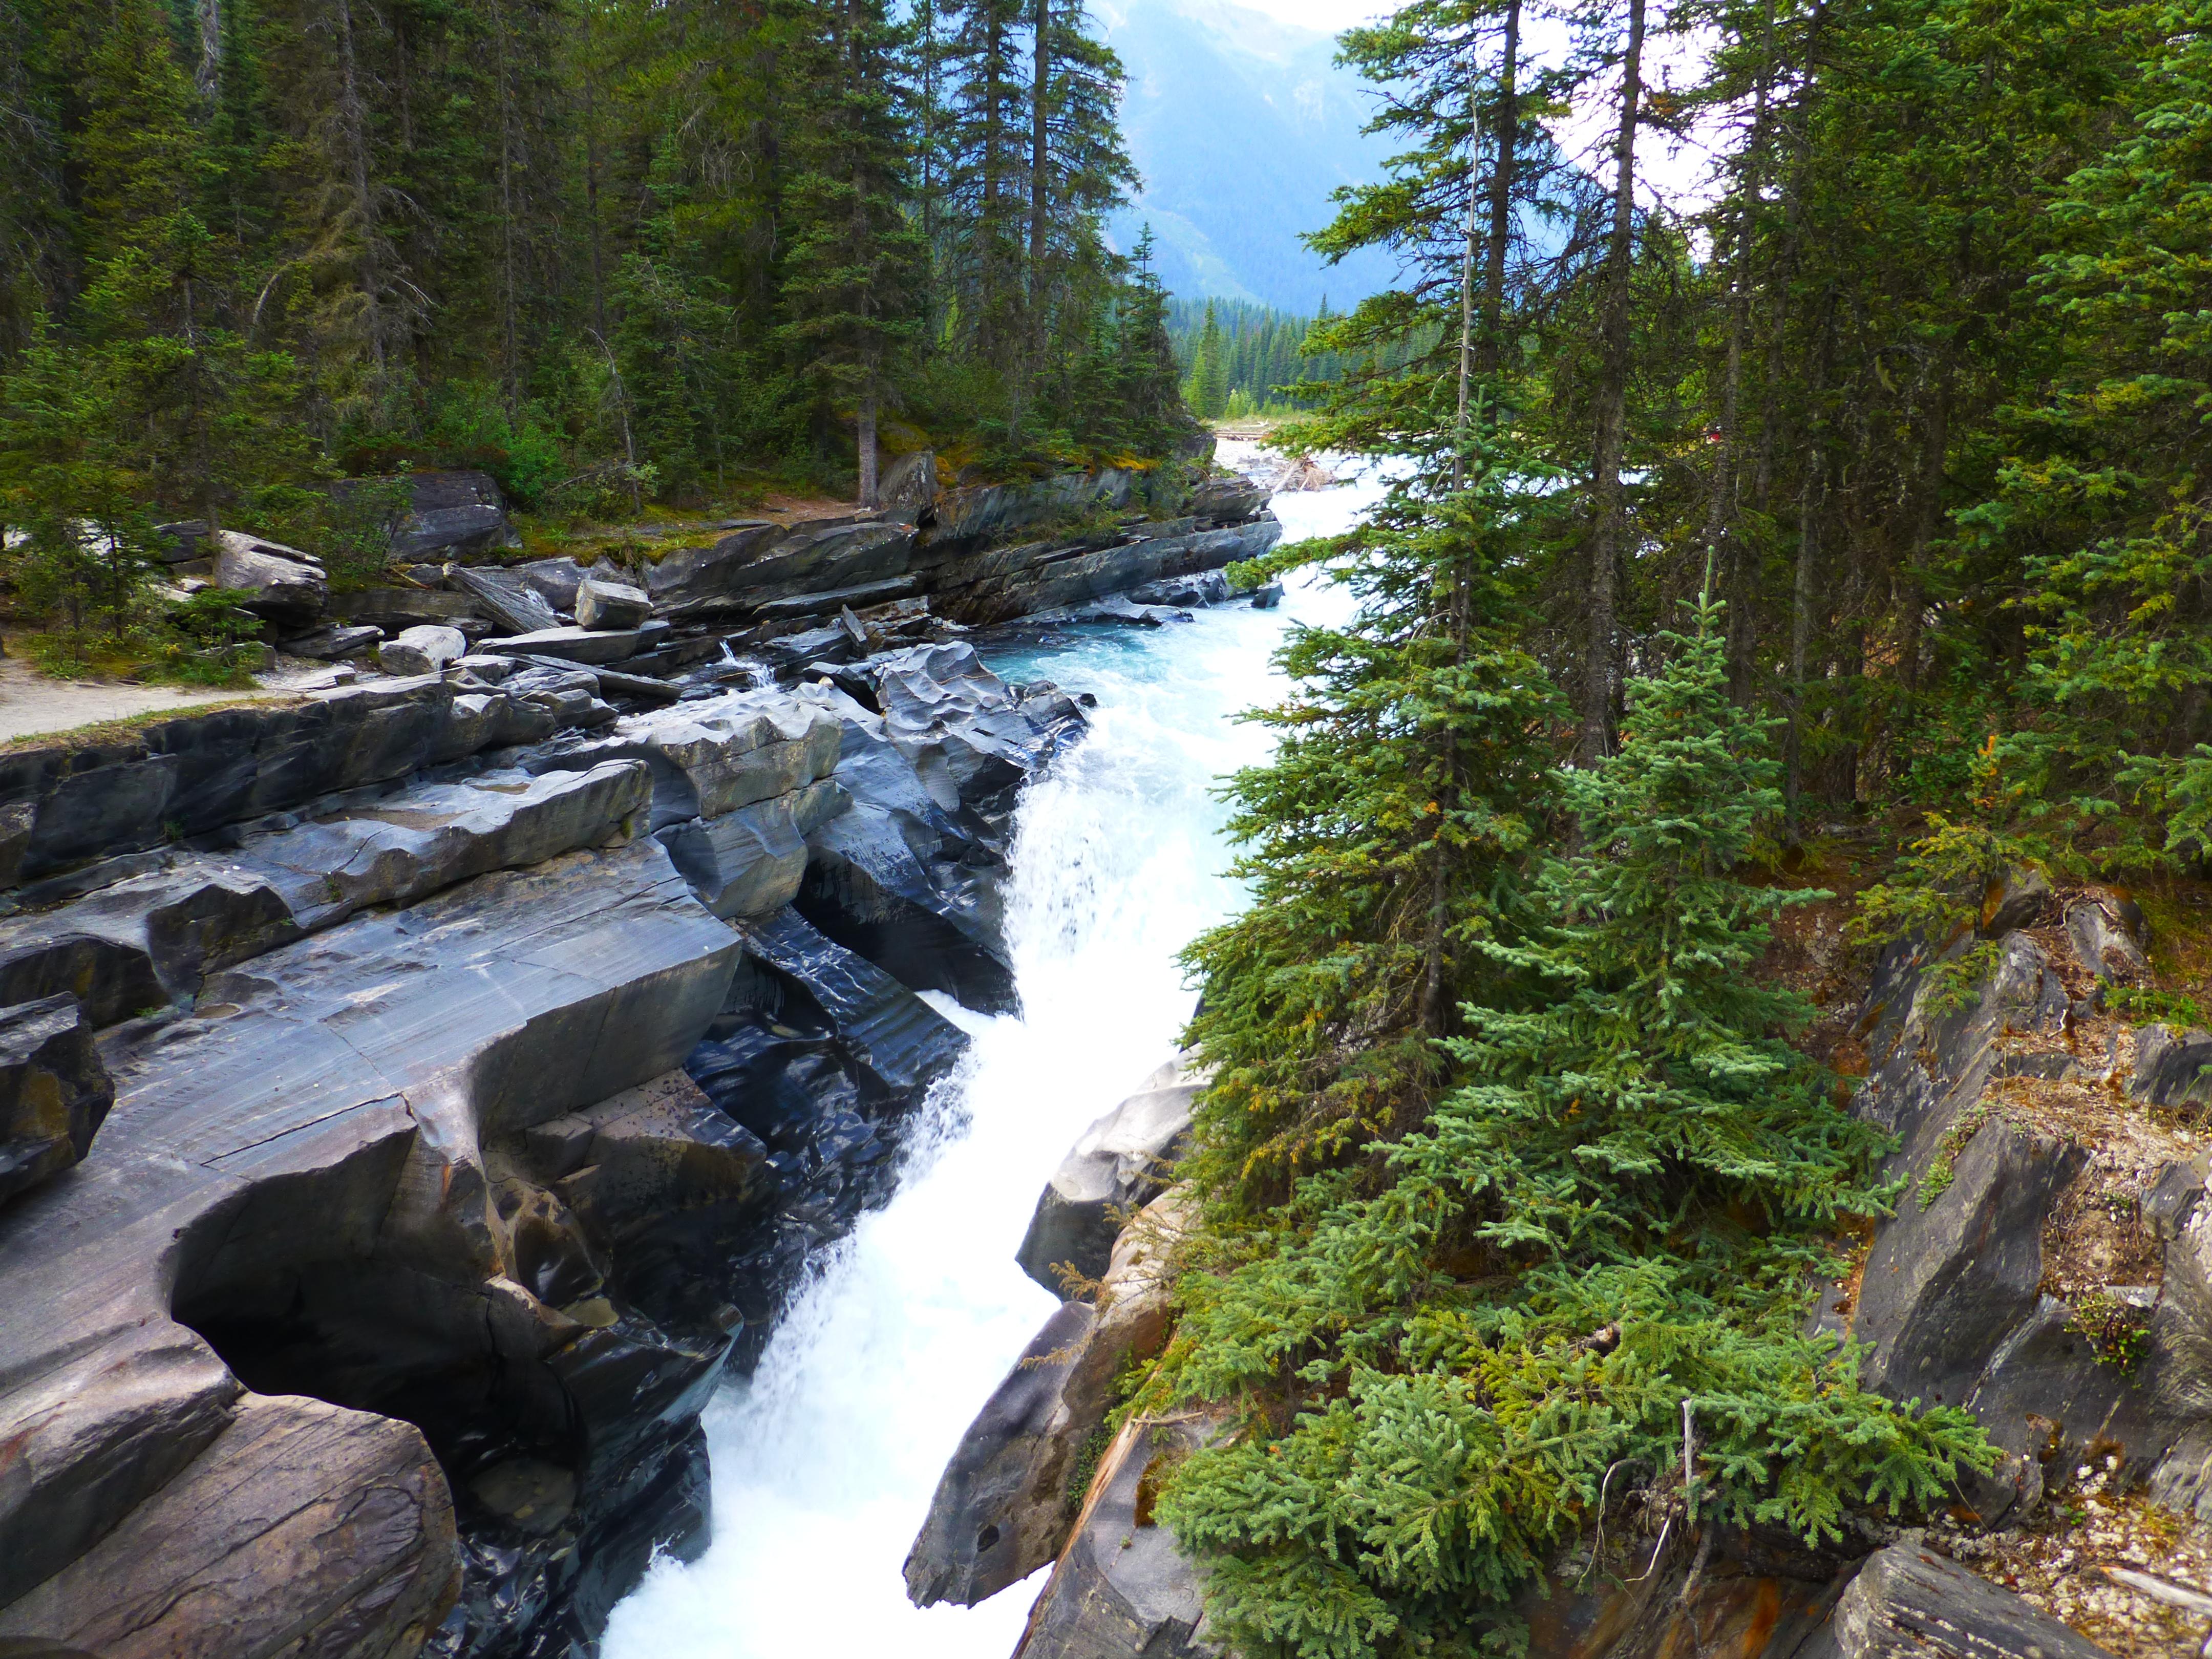 Banff and Kootenay National Parks, Canada Day 11 | andykatravels